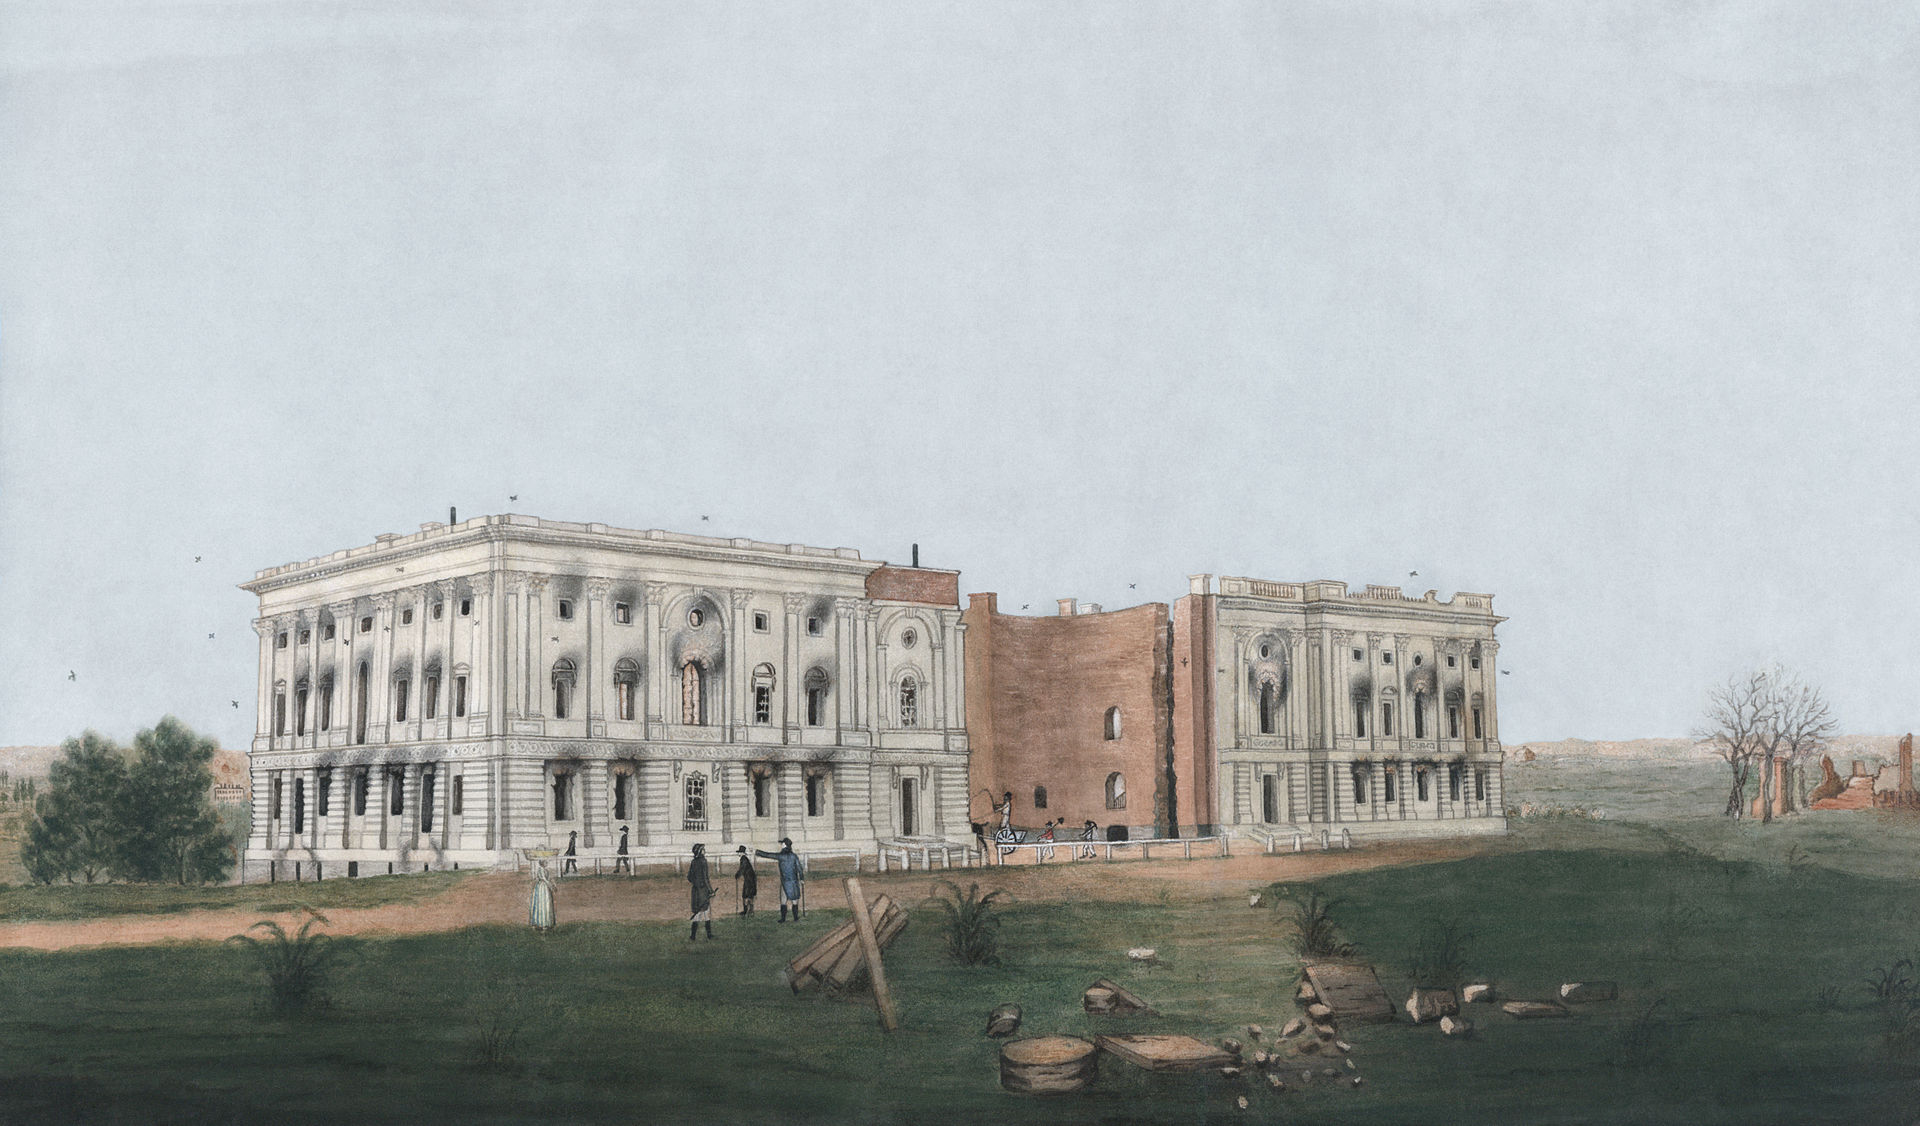 18 de agosto de 1812 Estados Unidos por primera vez